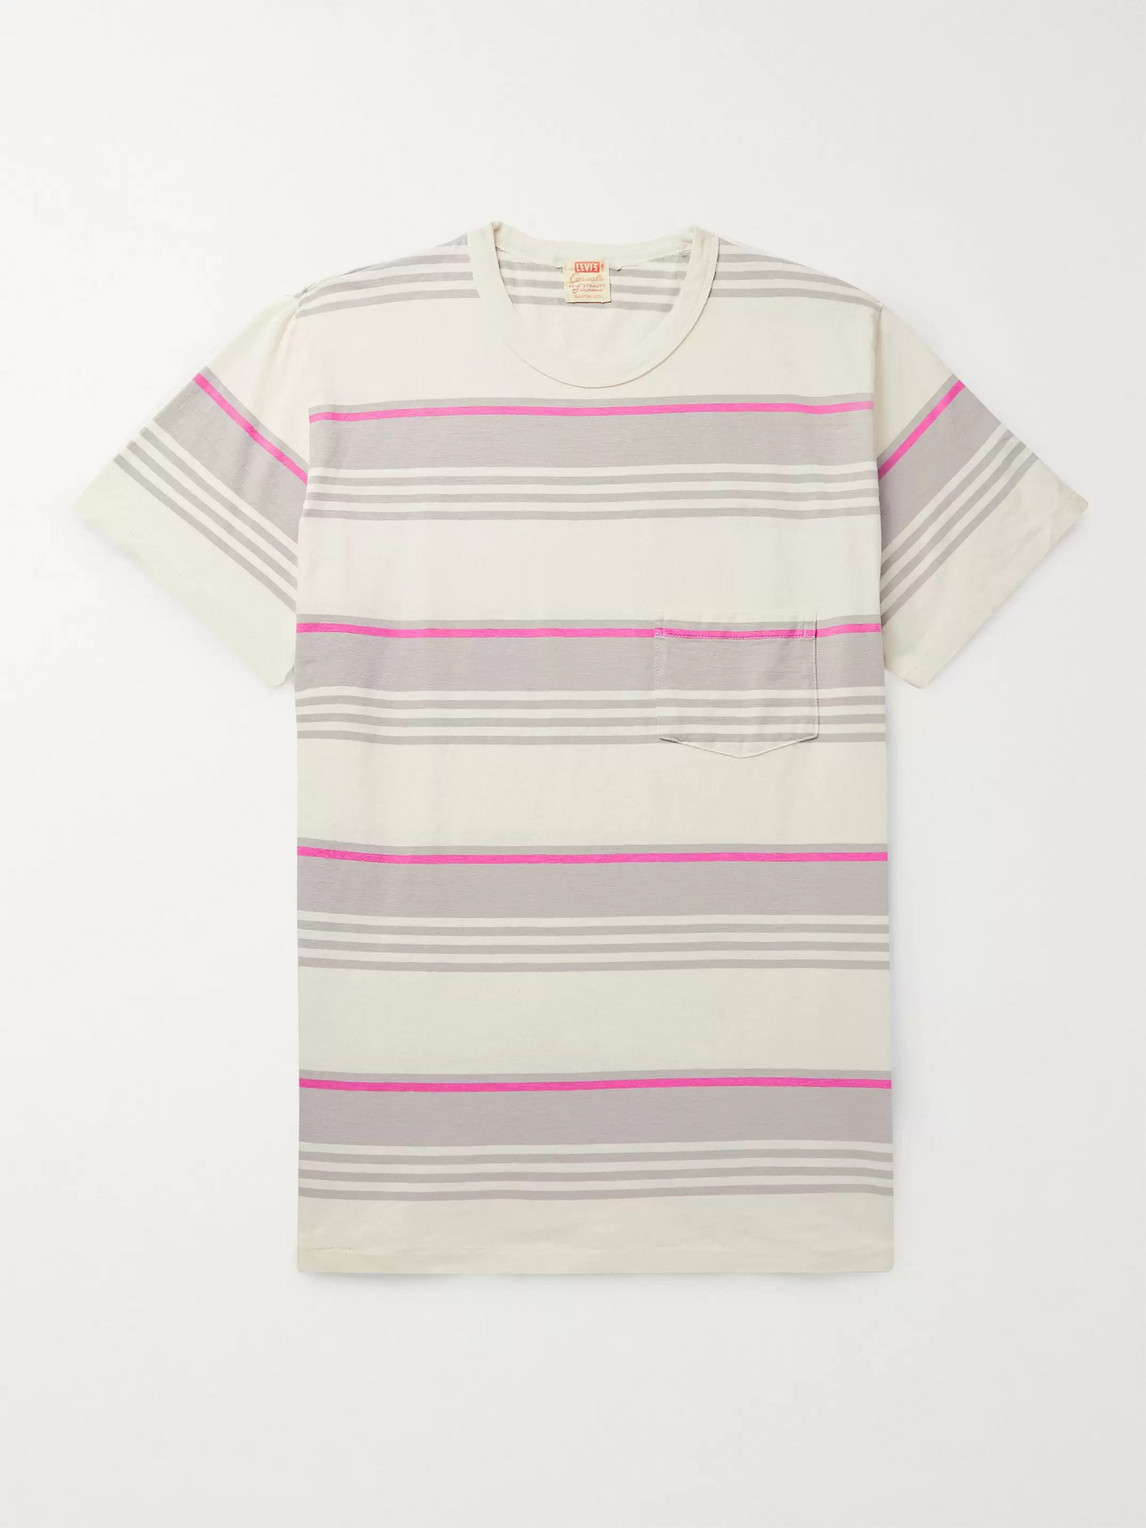 levi's vintage clothing - 1960s striped cotton-jersey t-shirt - men - gray